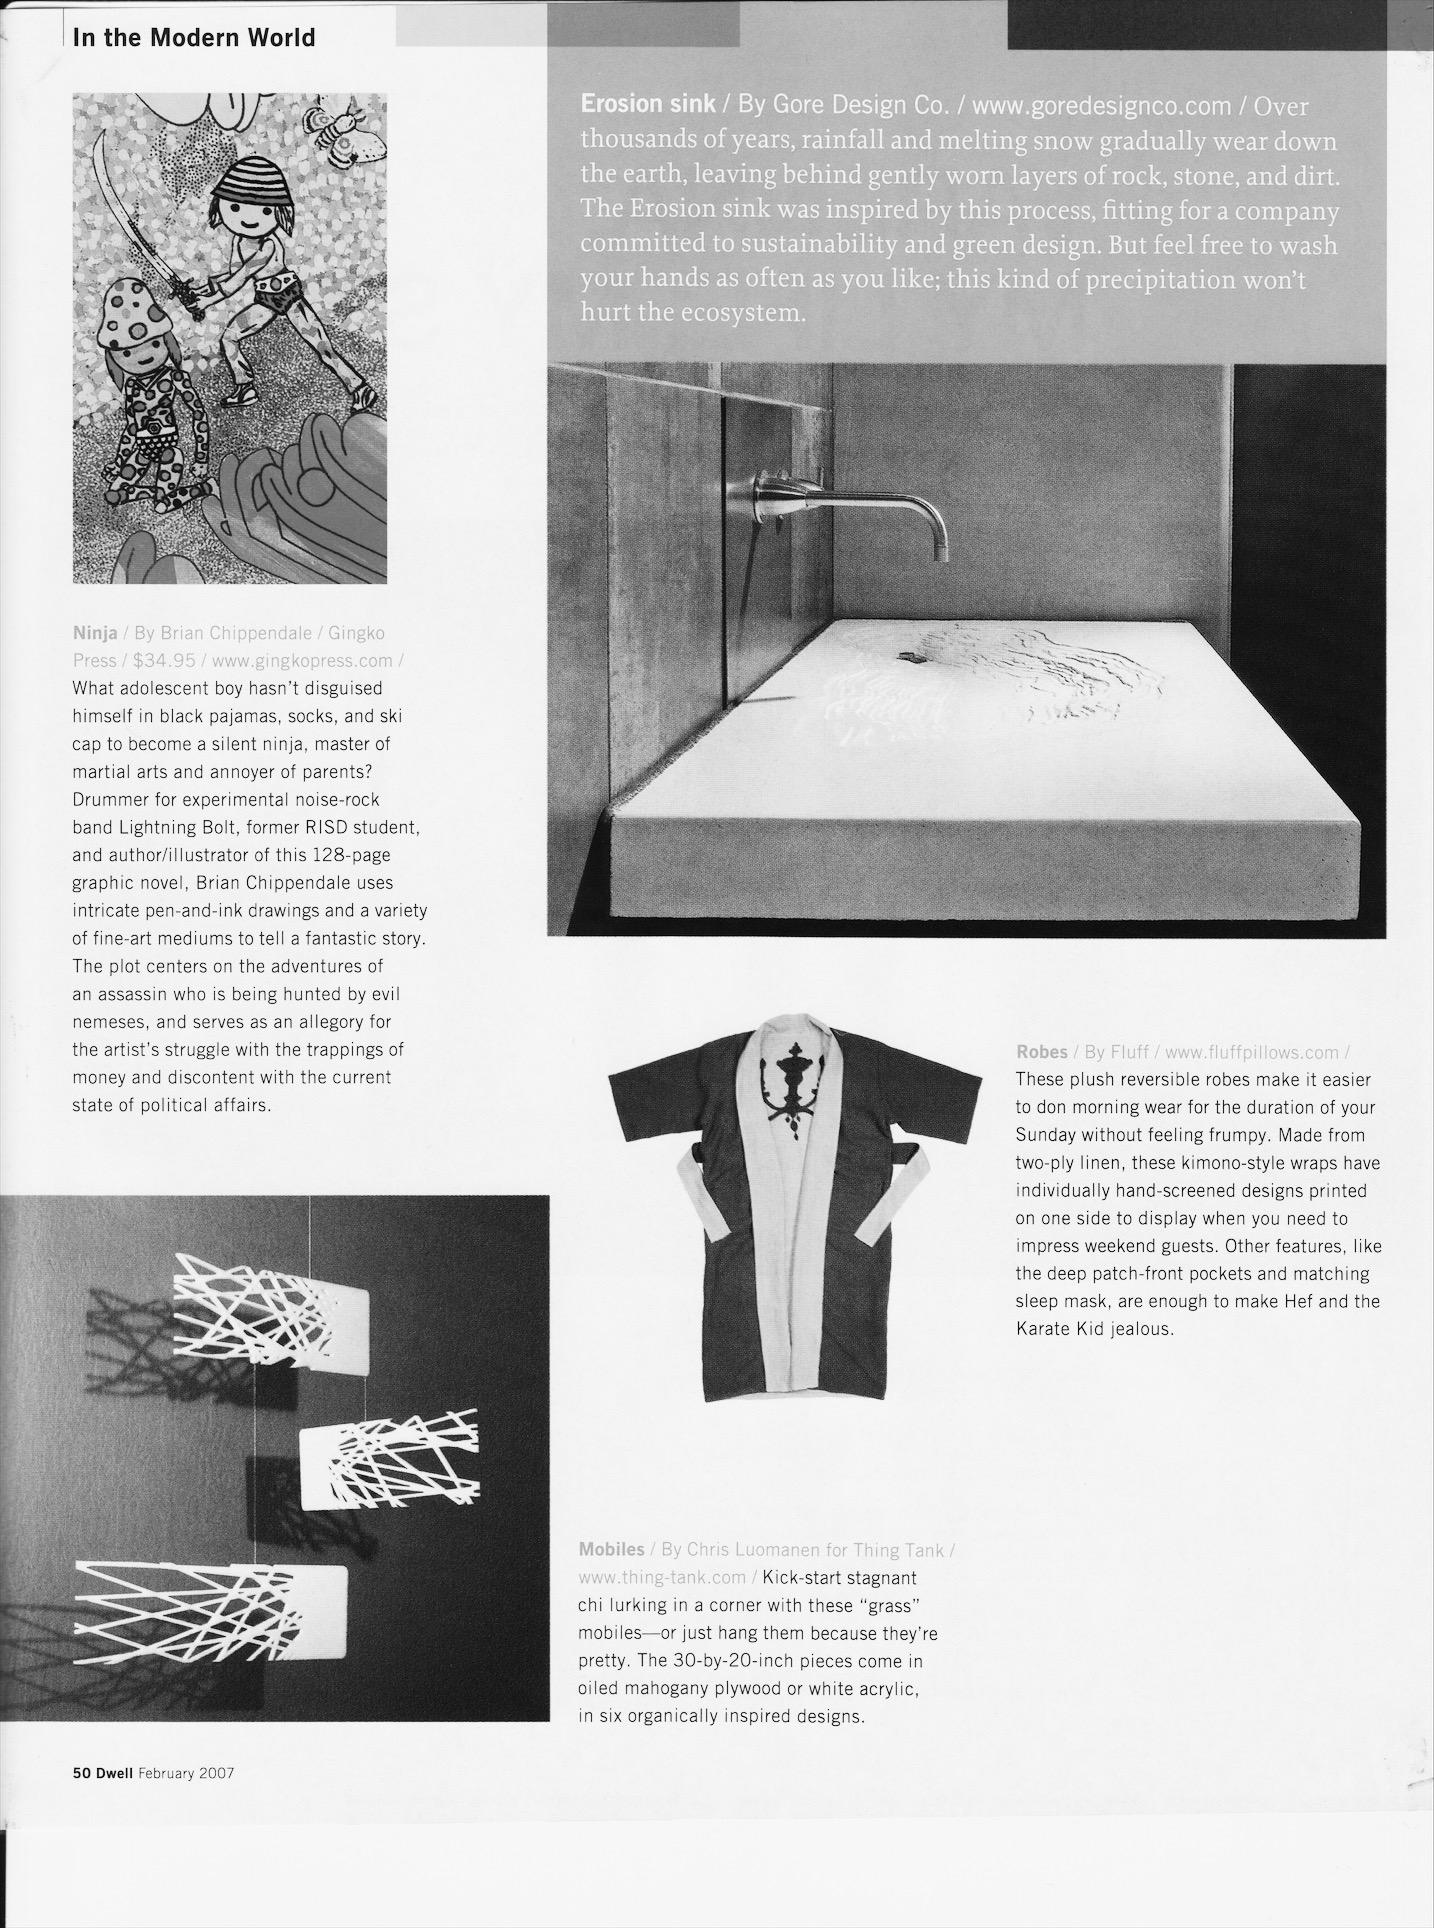 brandon-gore-dwell-magazine-erosion-sink-2.JPG